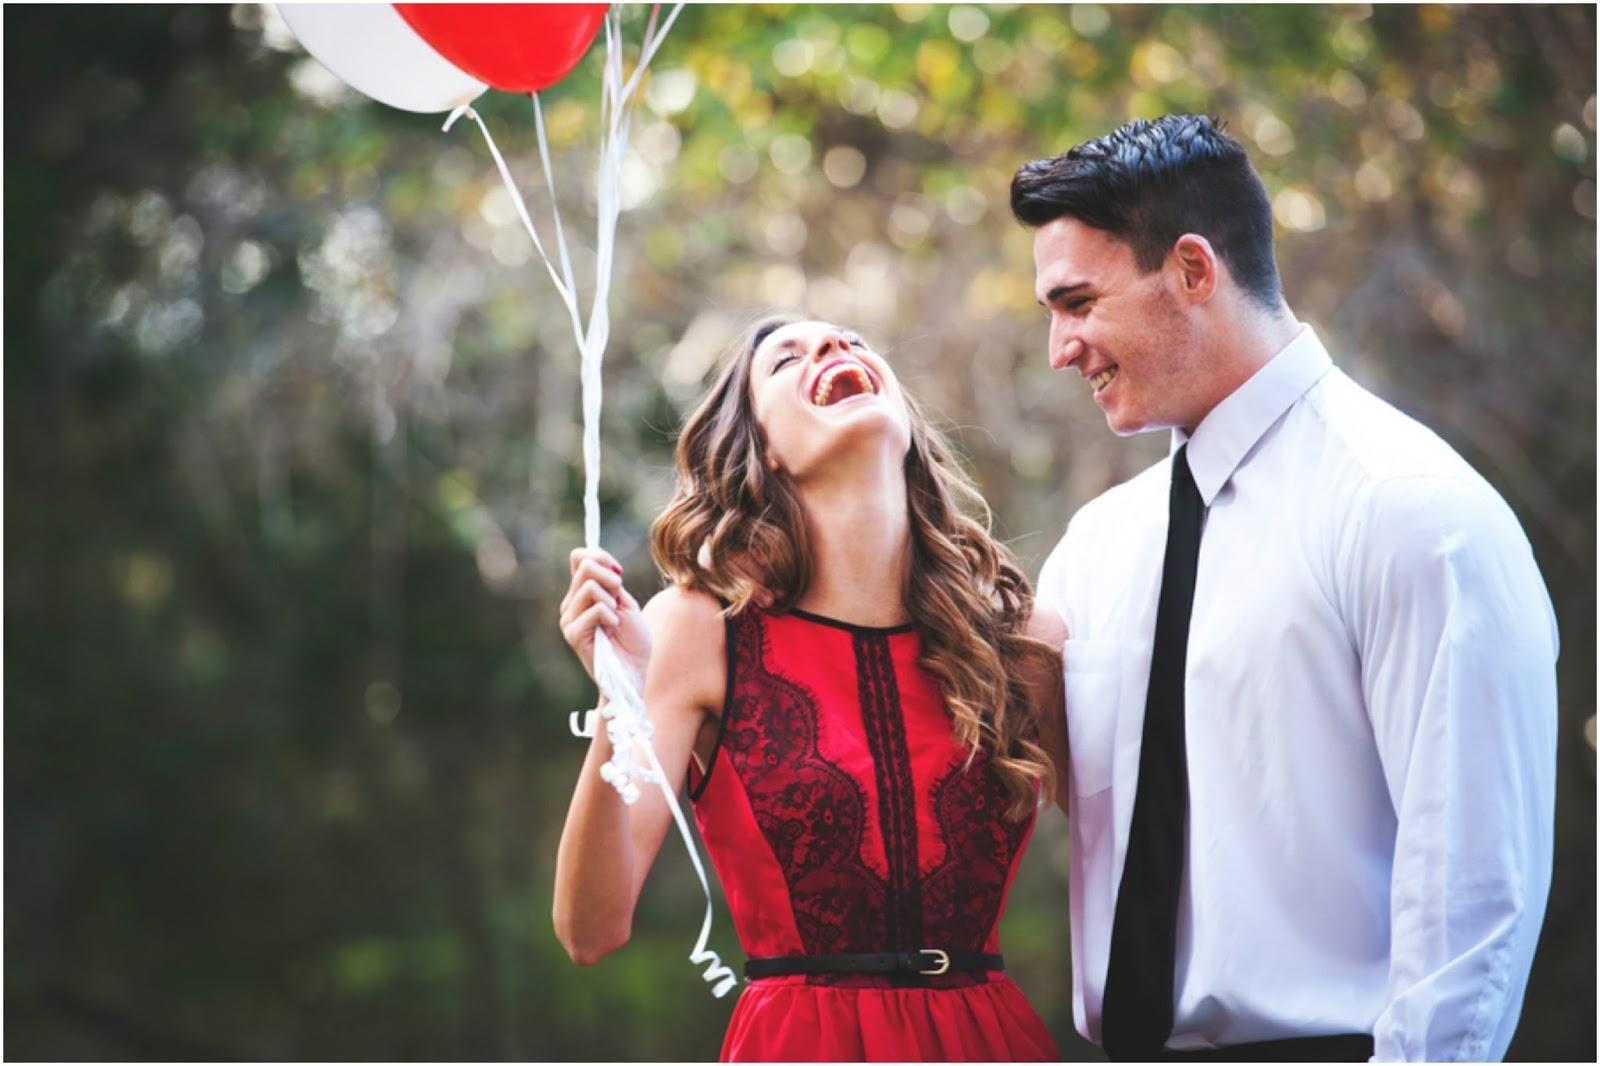 10 Cheap Yet Romantic Valentine's Date Ideas